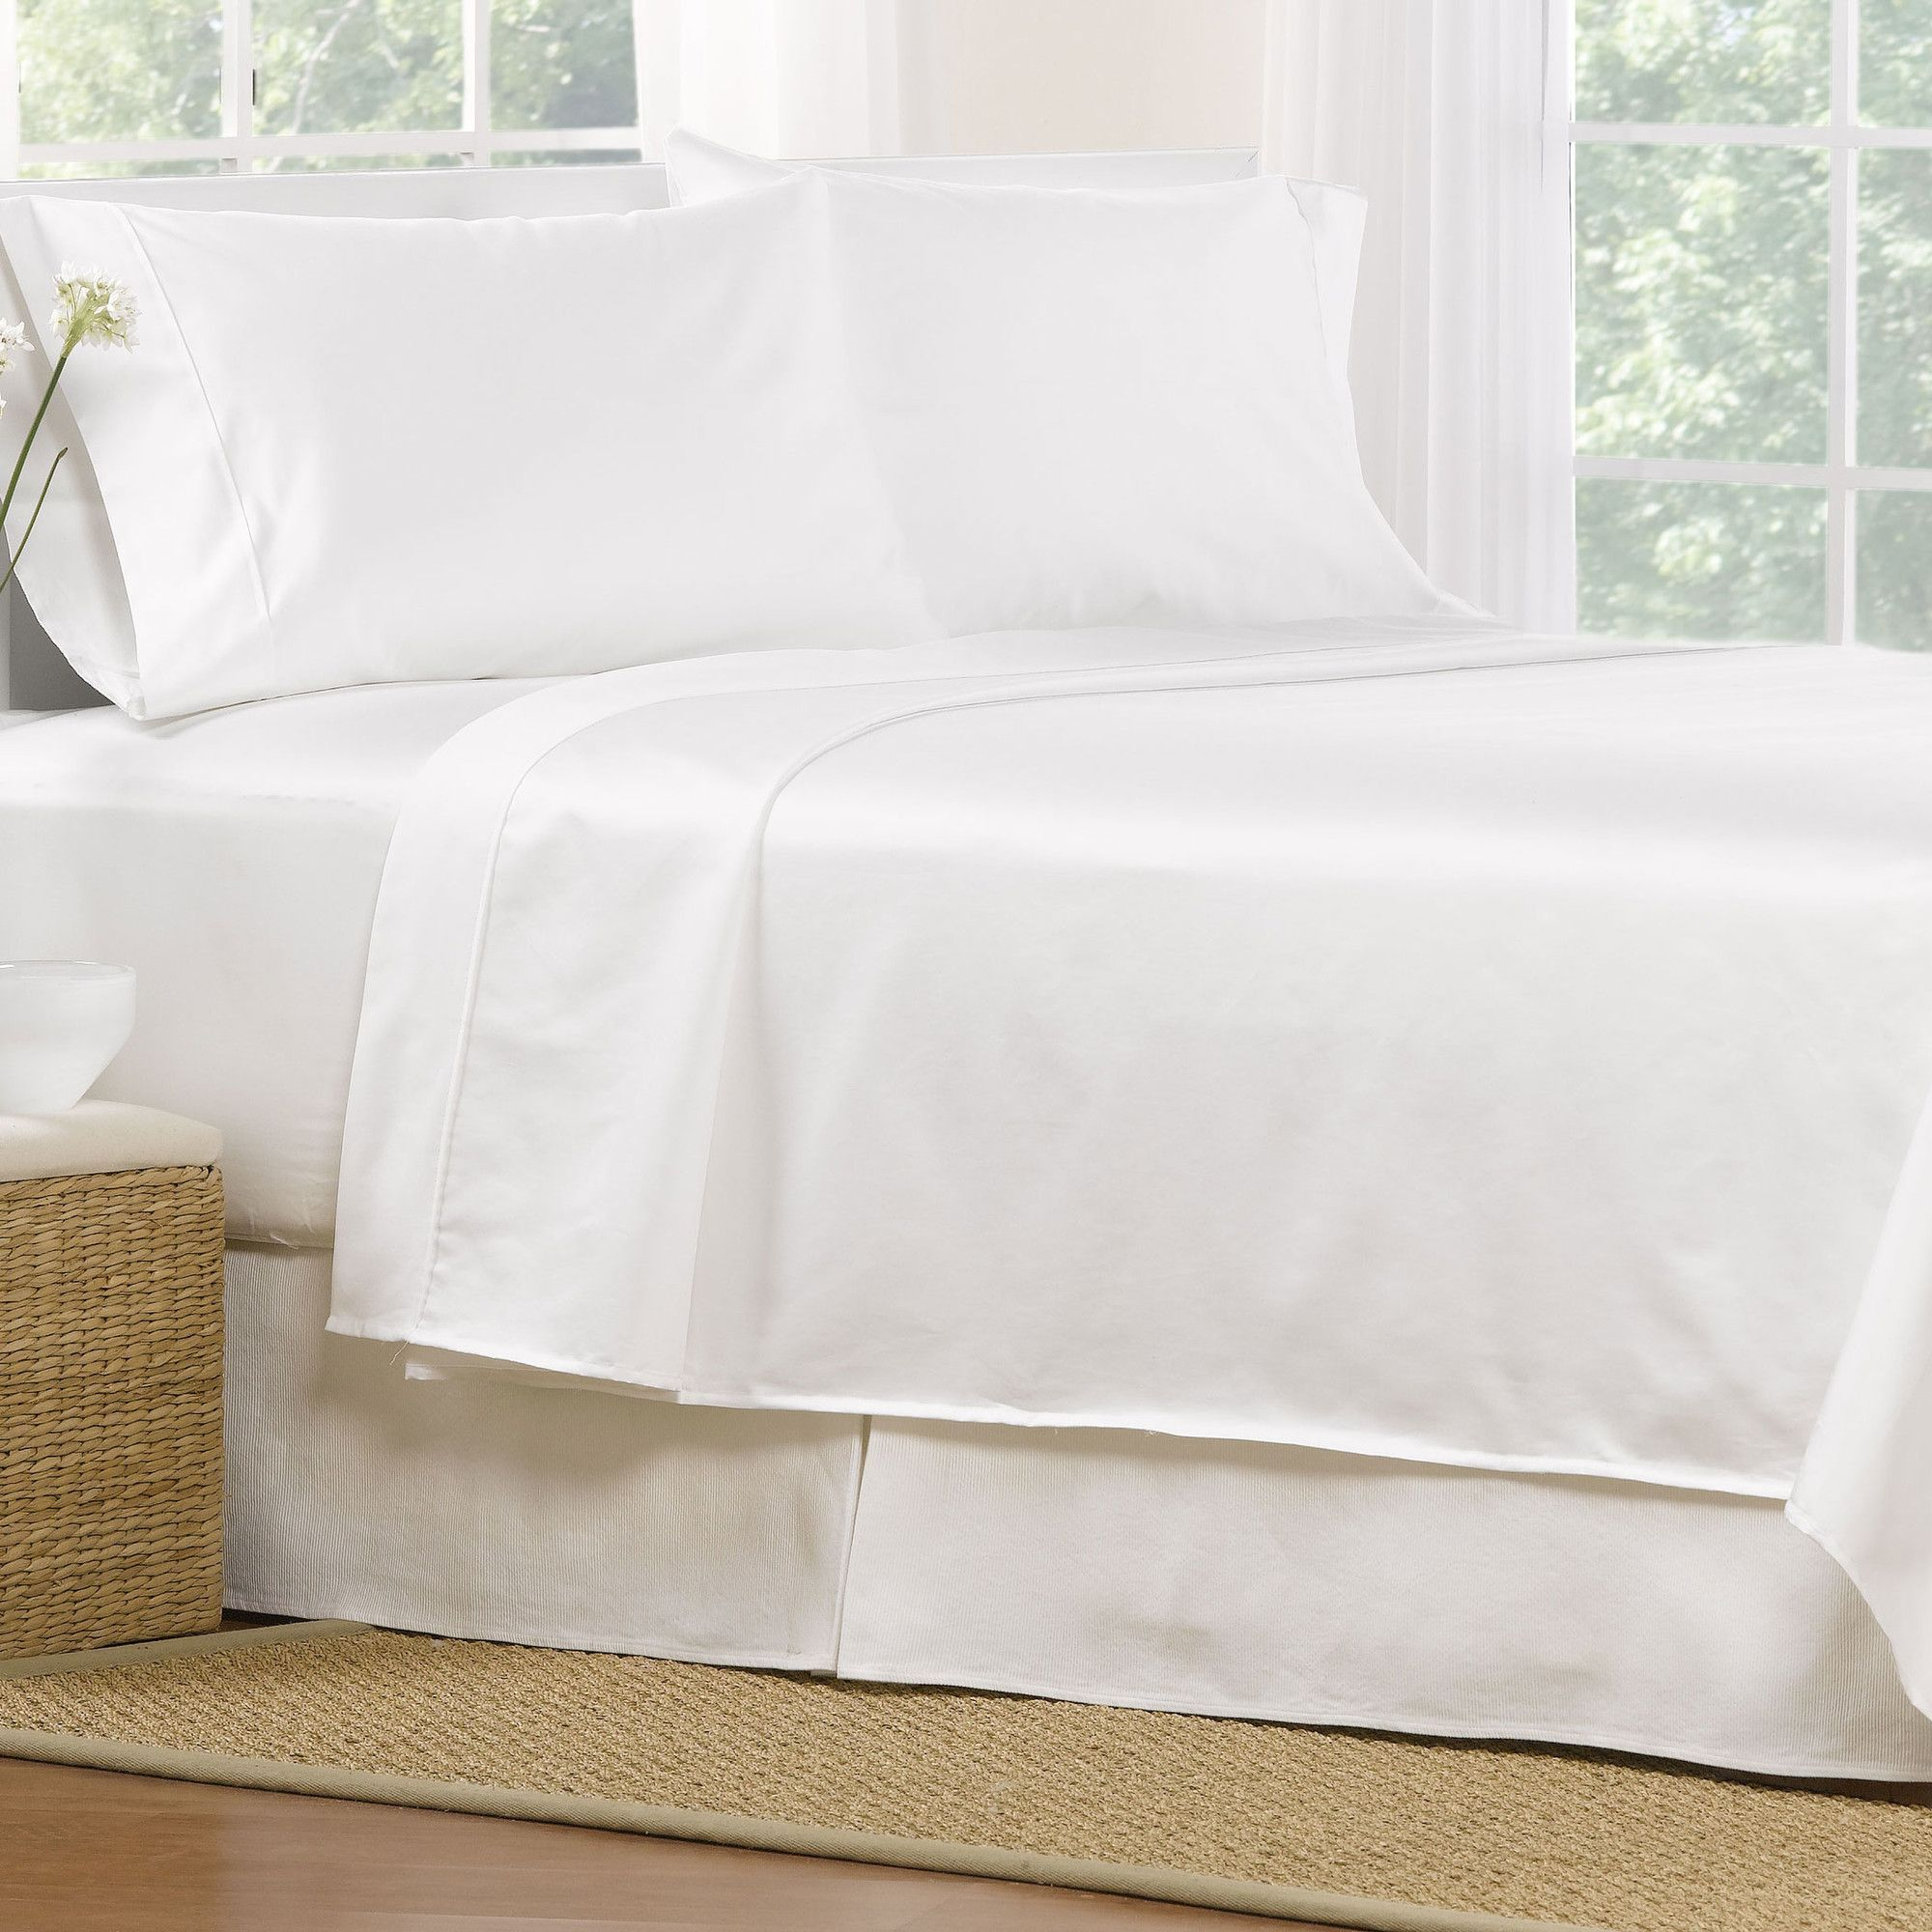 4 piece 1000 thread count egyptian quality cotton sheet set cotton